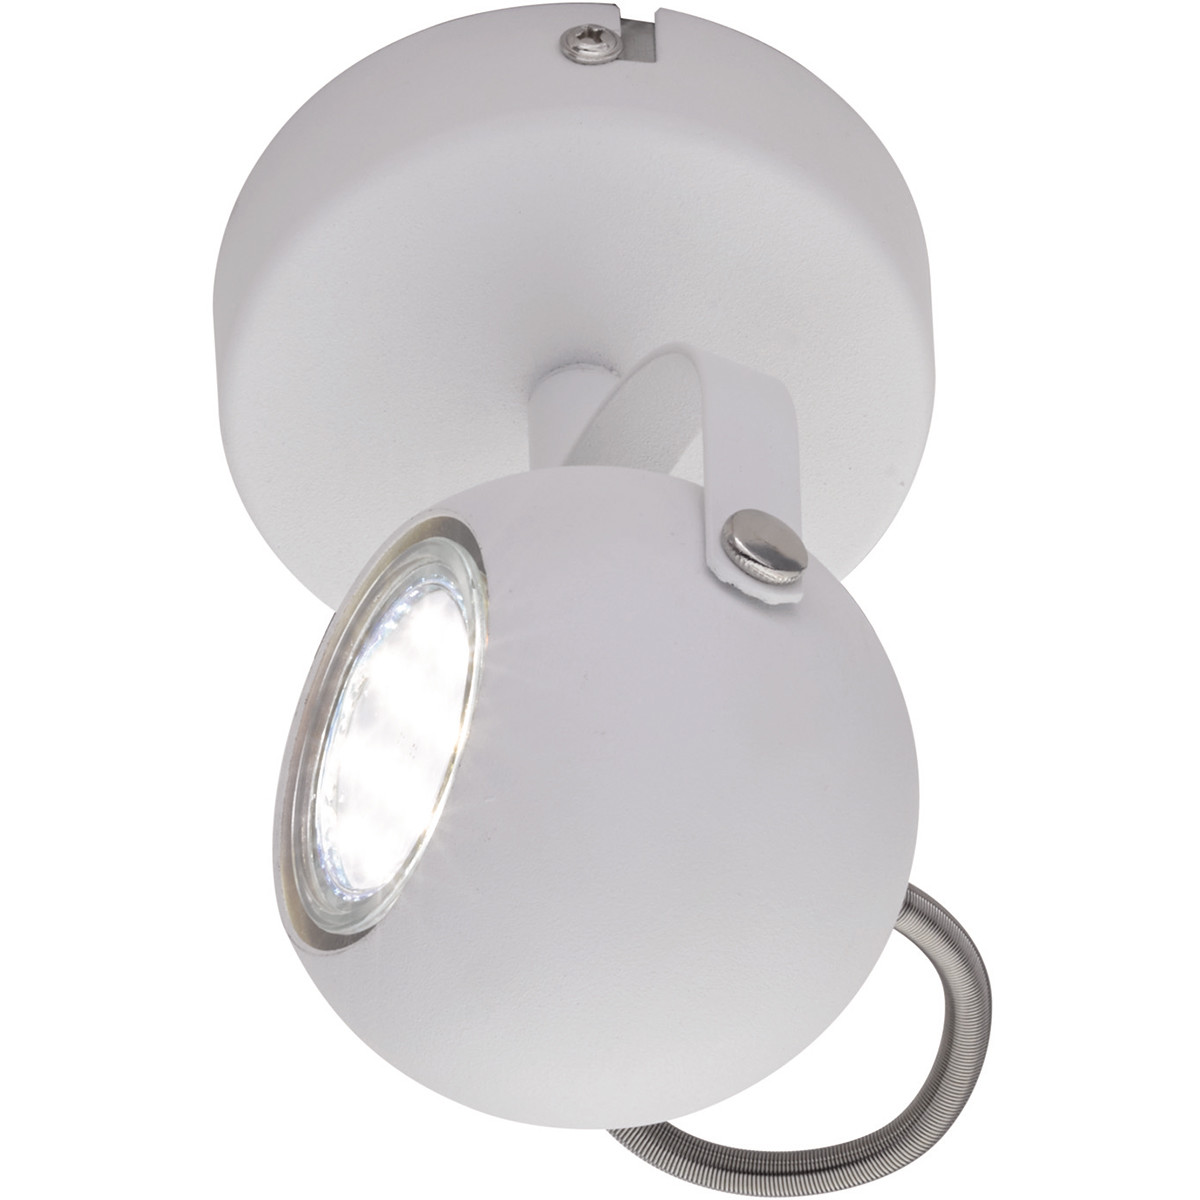 LED Plafondspot - Trion Bosty - GU10 Fitting - 1-lichts - Rond - Mat Wit - Aluminium